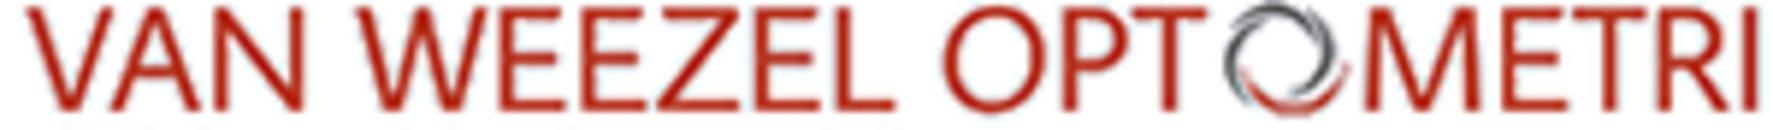 Van Weezel Optometri logo